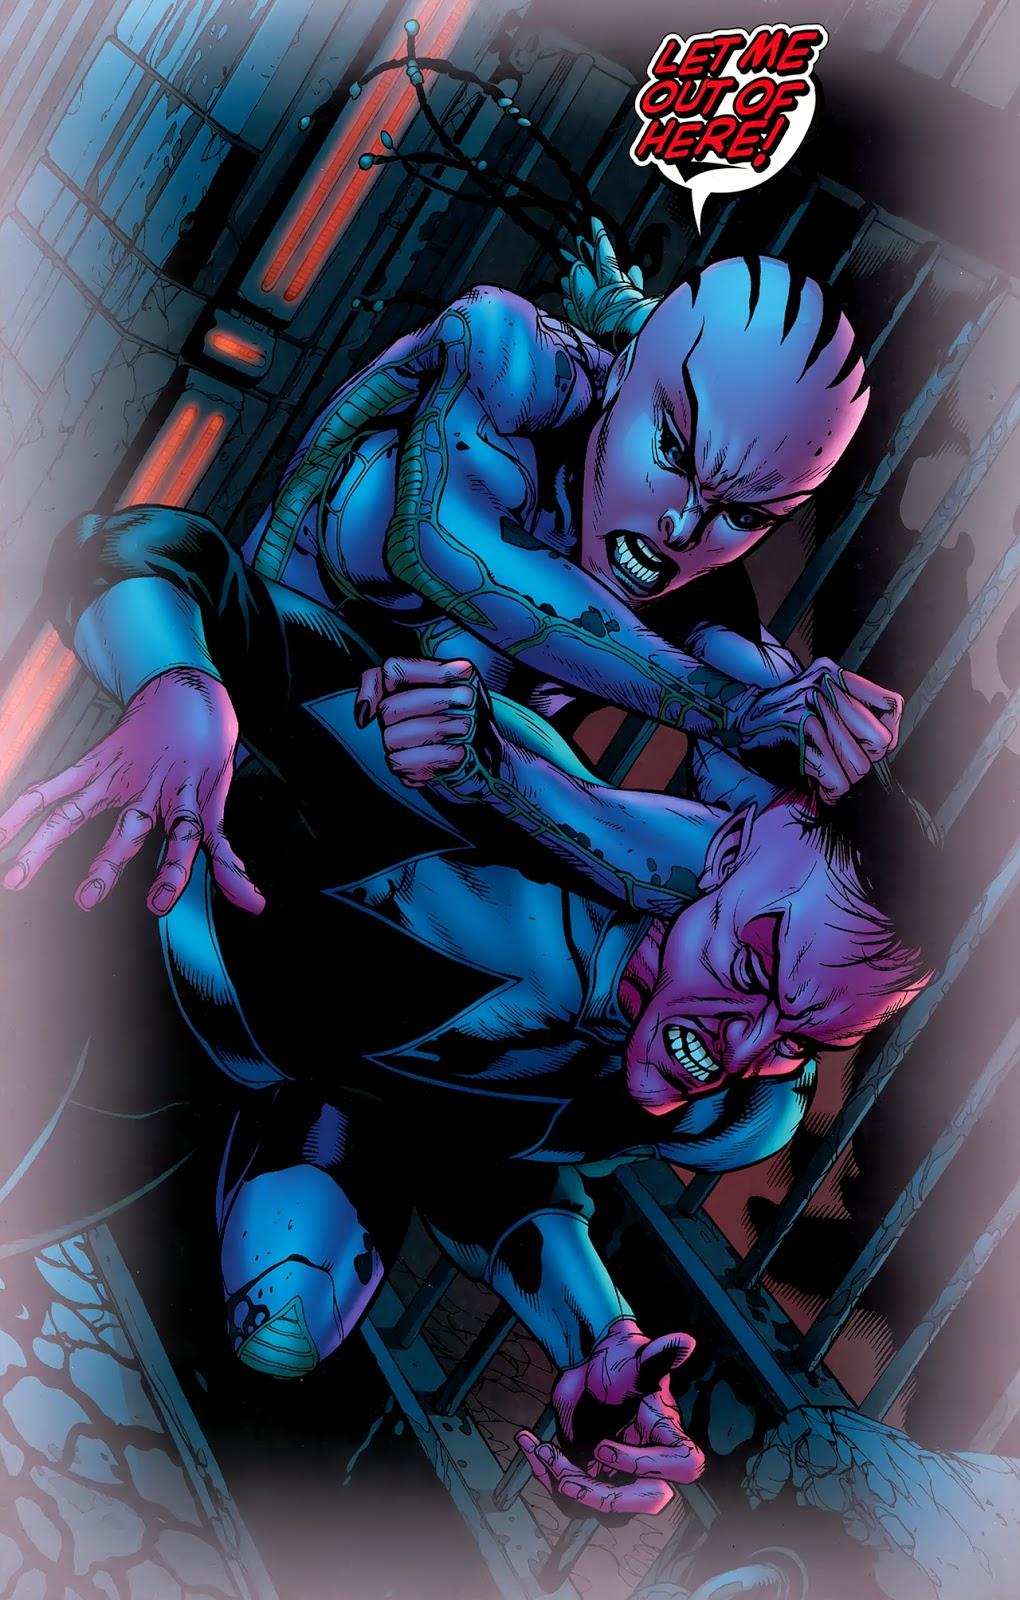 Indigo-1 (Green Lantern Vol. 4 #66)